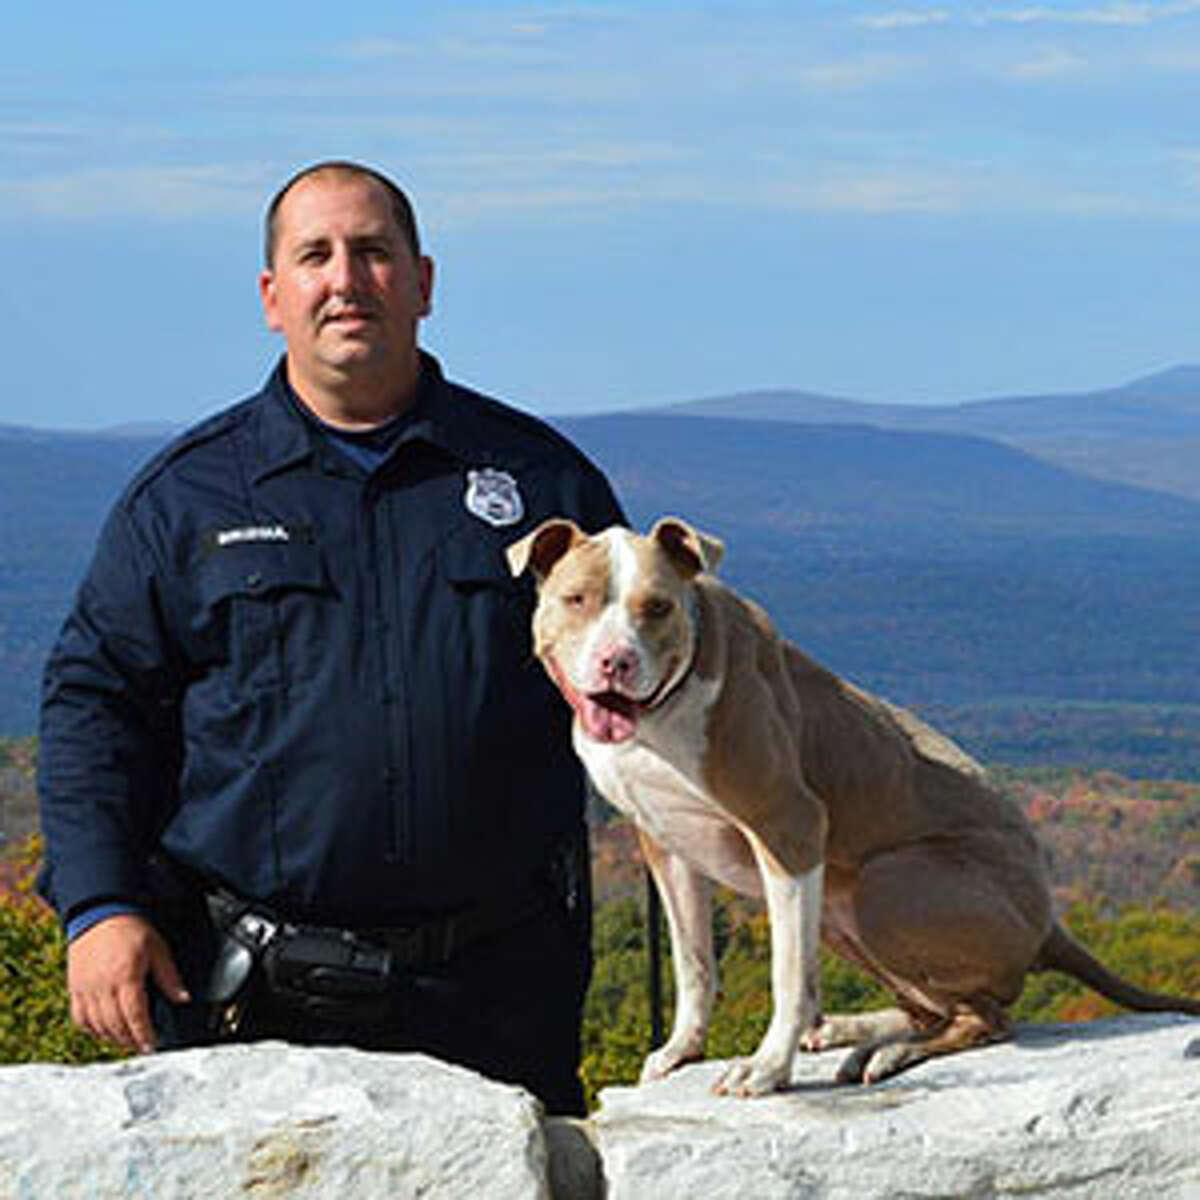 K9 Kiah poses with her handler, Poughkeepsie police Officer Justin Bruzgul. (Animal Farm Foundation)